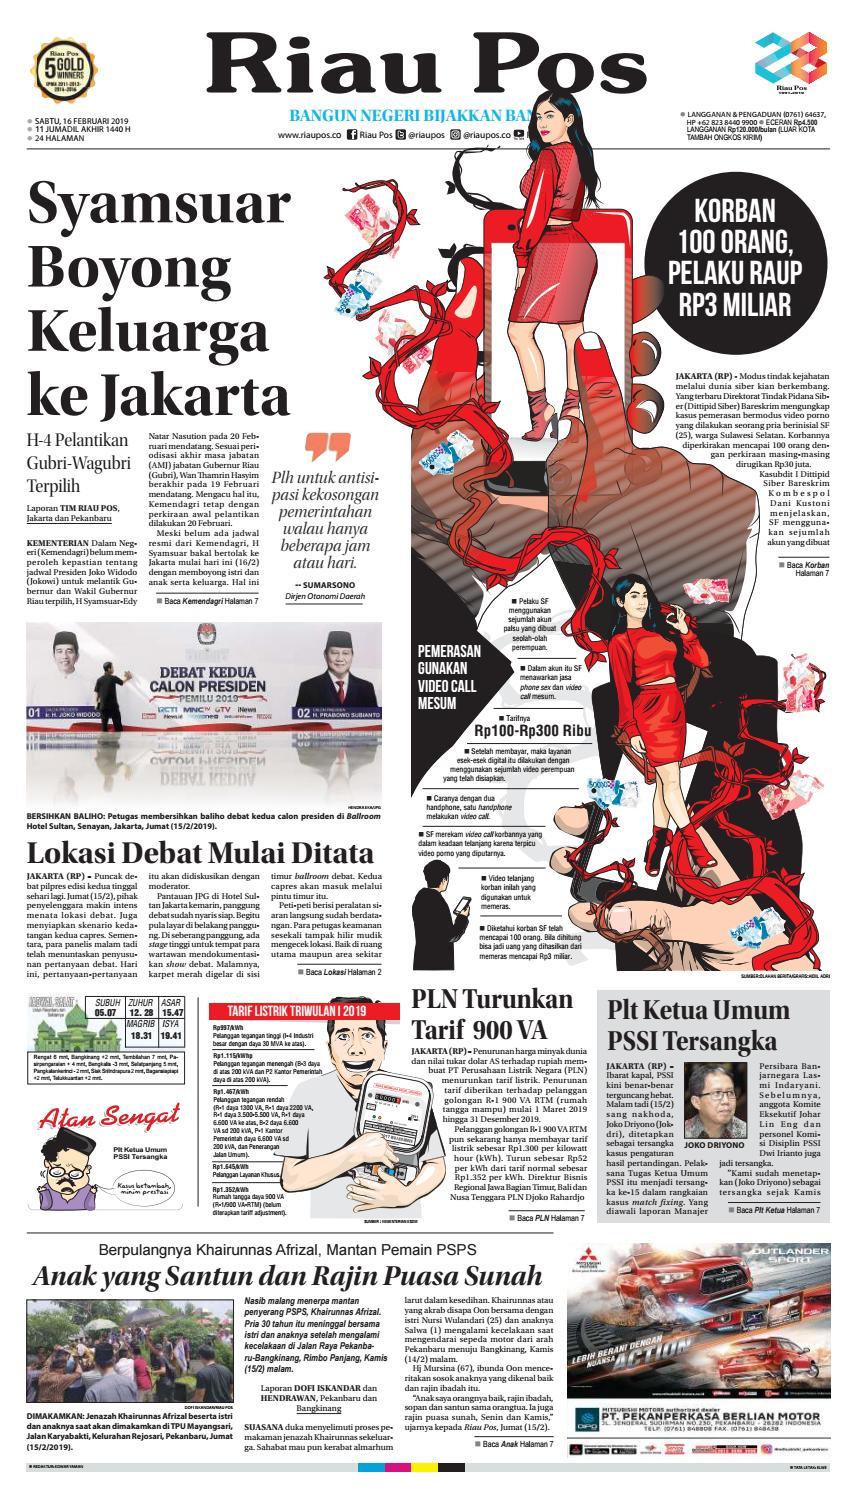 Riau Pos Edisi Sabtu 16 Februari 2019 By Riau Pos Issuu